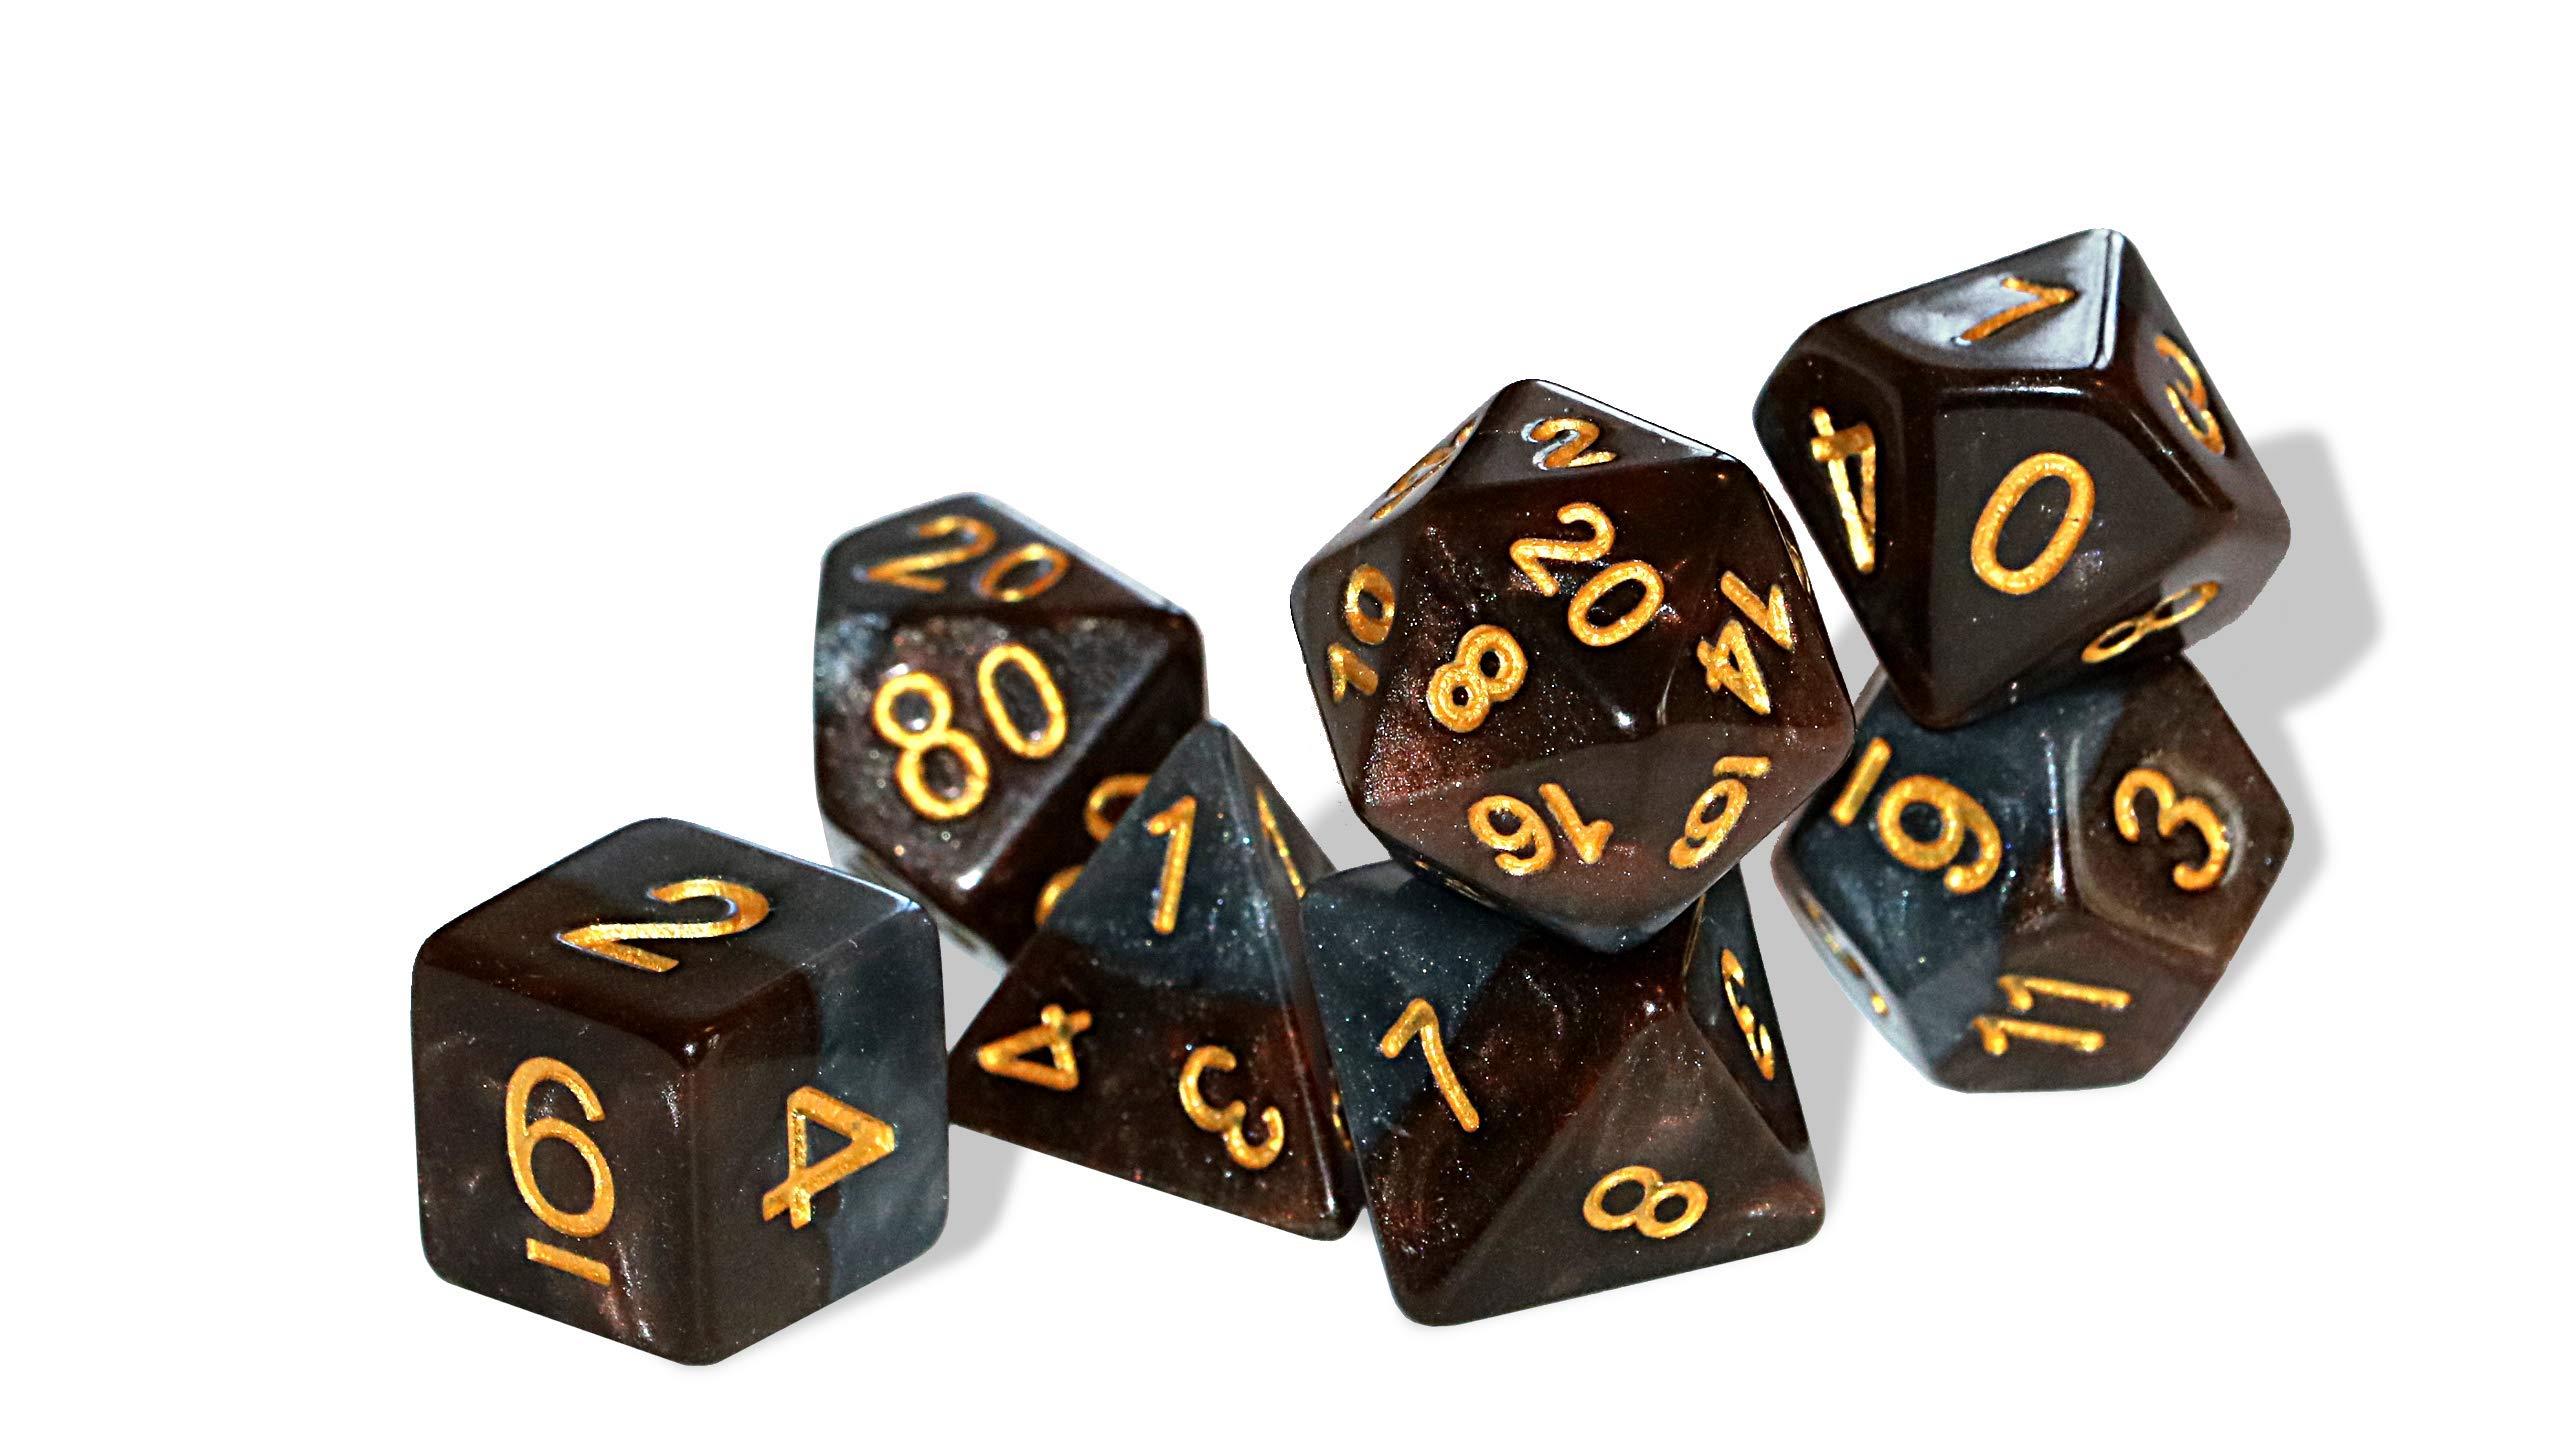 Gate Keeper Games Halfsies Dice Dwarf 7 Dice Polyhedral Set